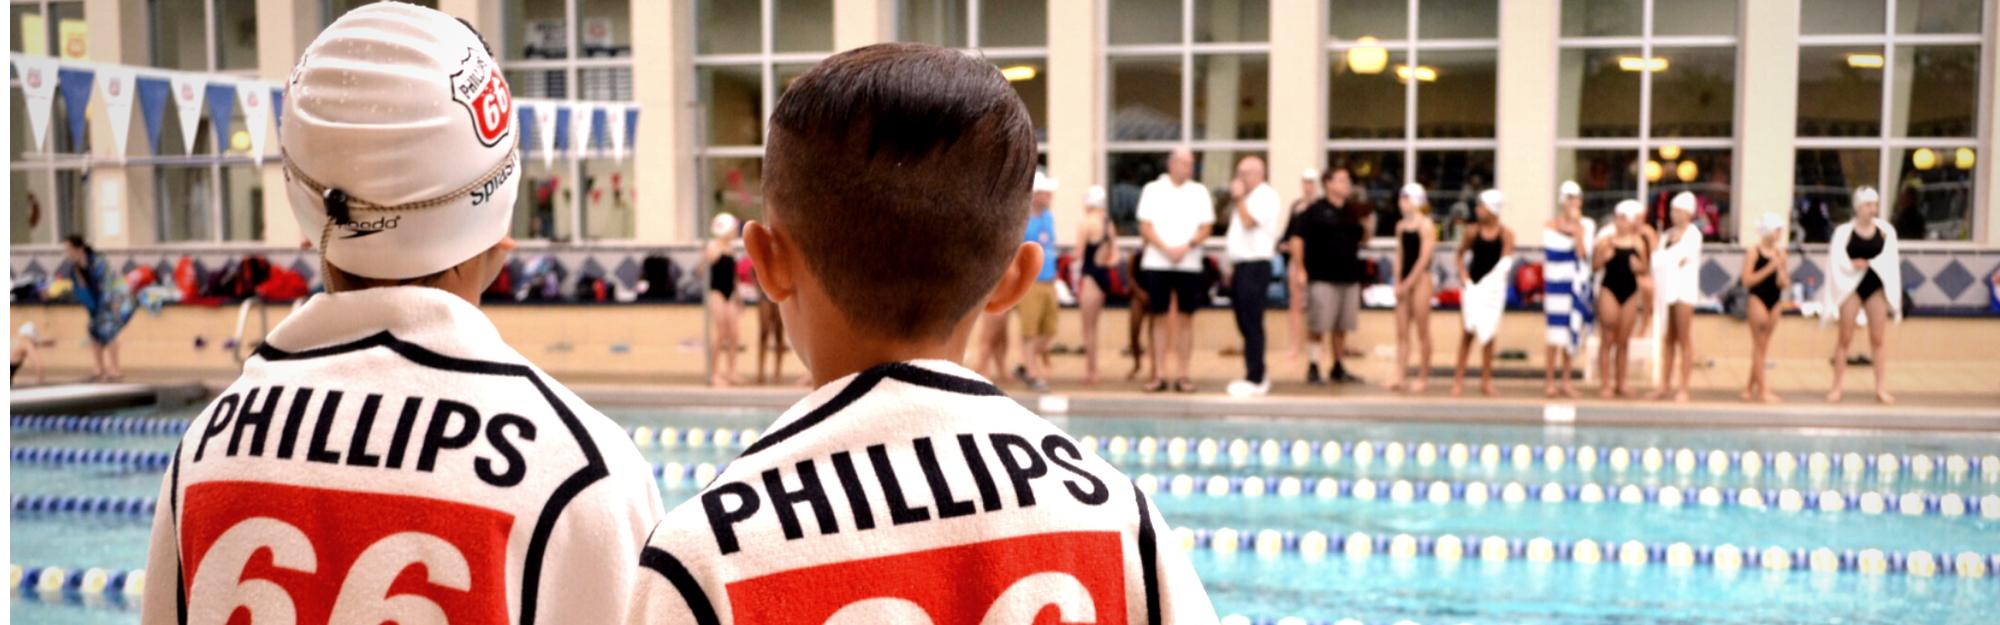 Towels - Splash Club.png